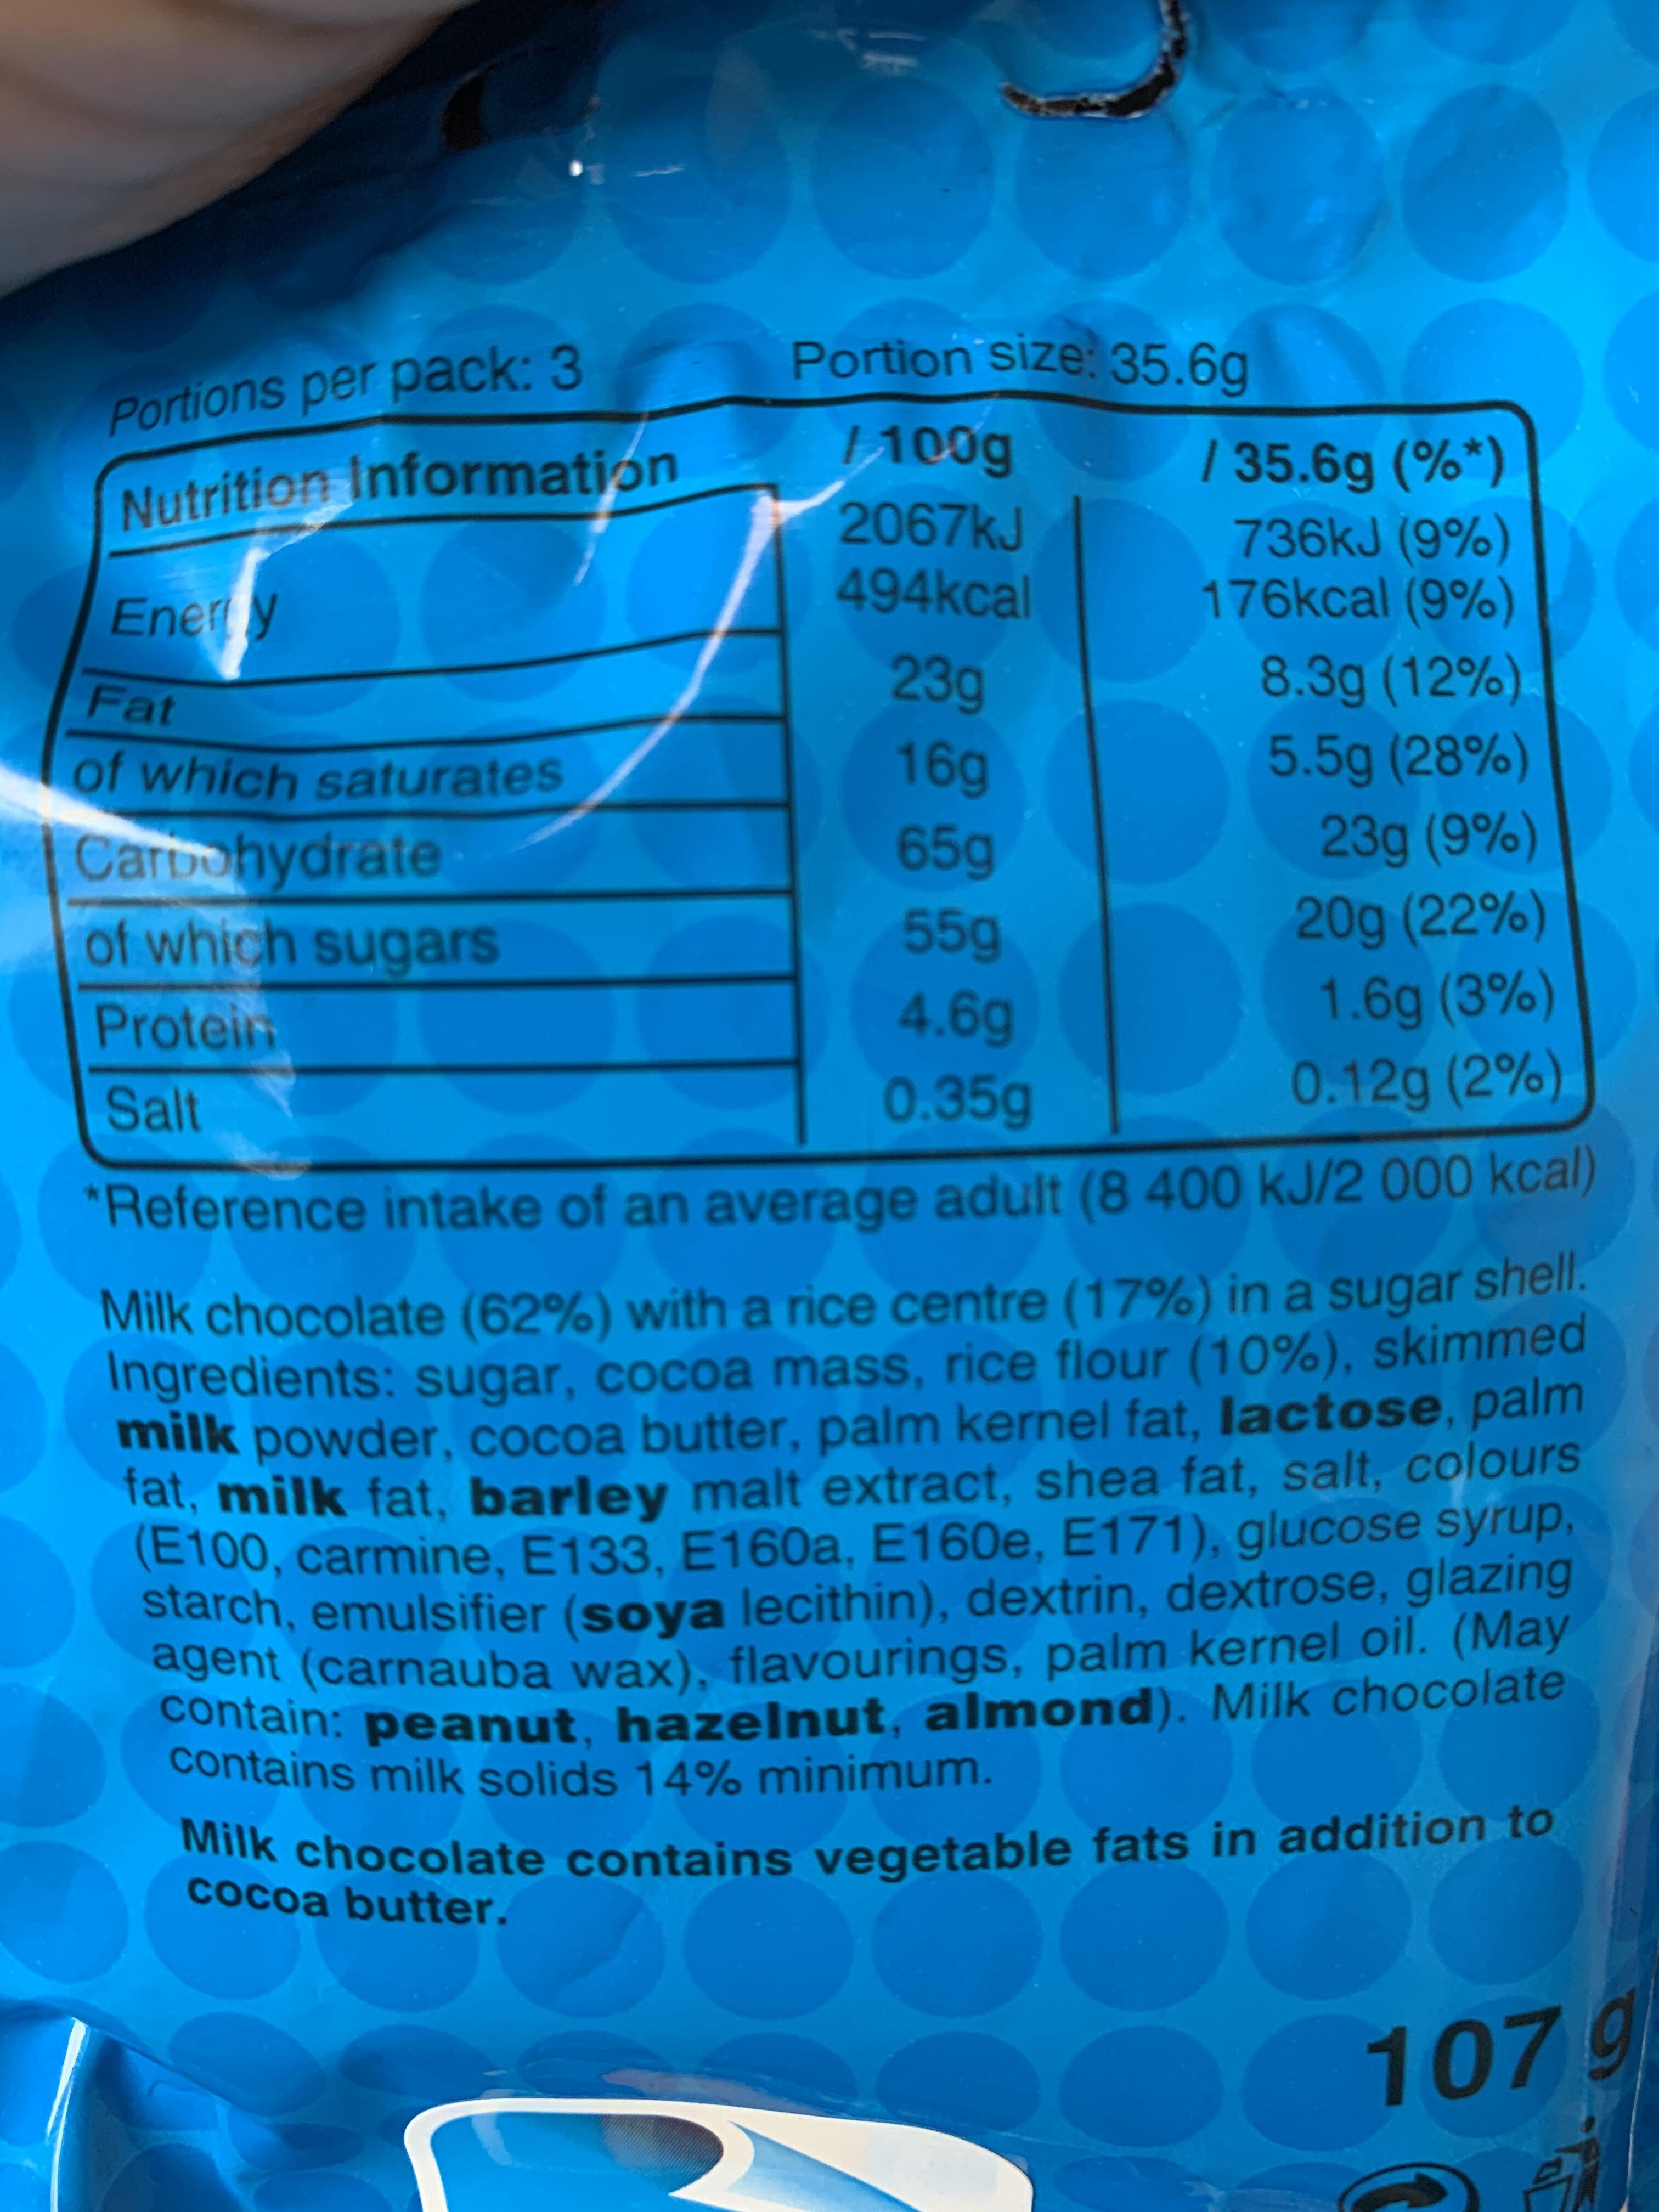 M&S Crispy - Nutrition facts